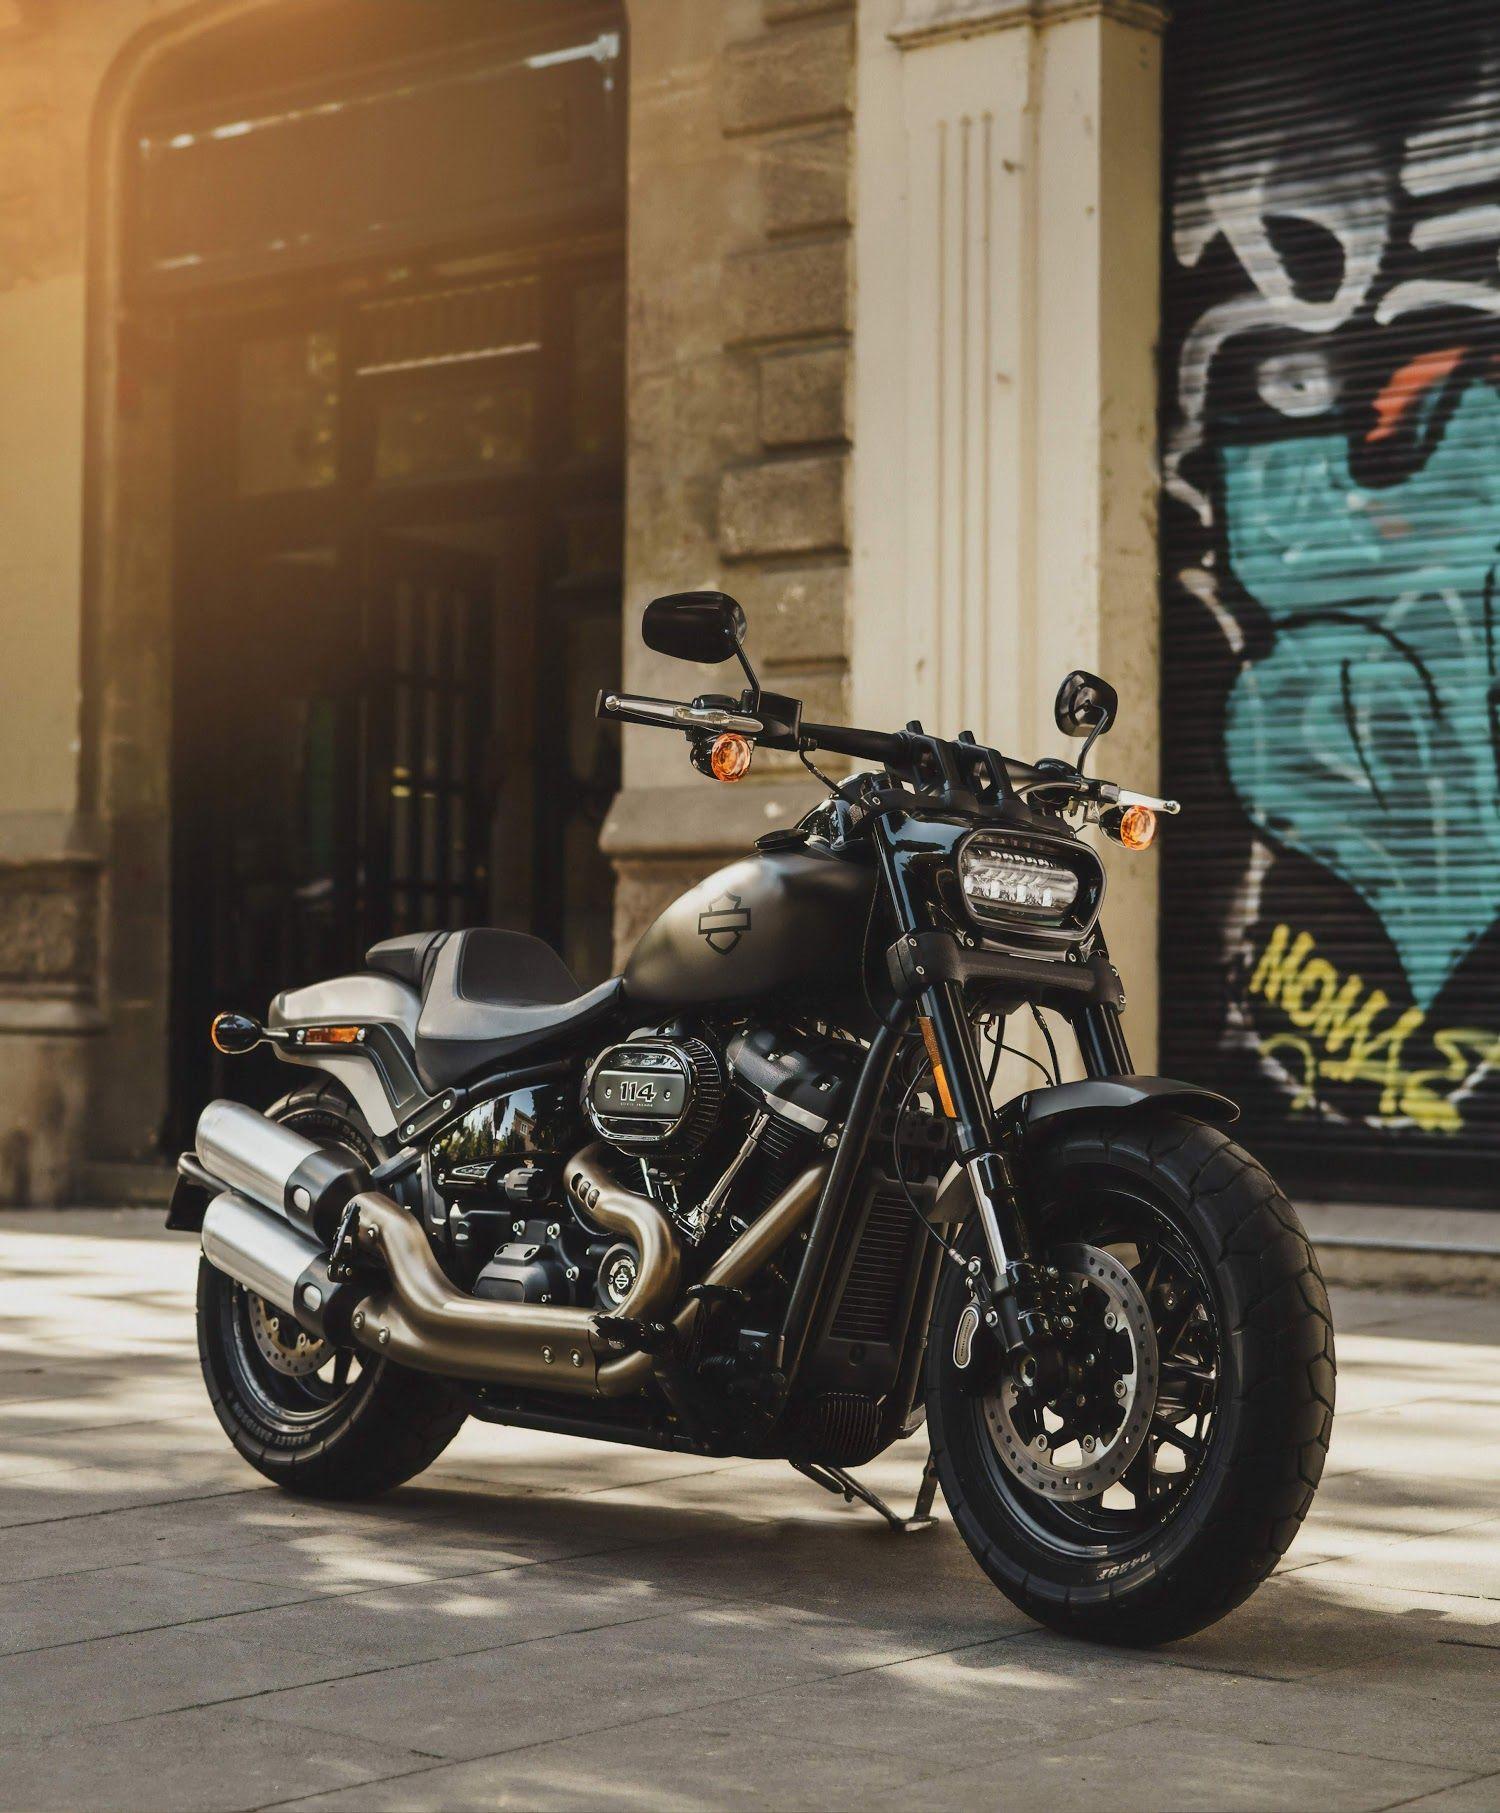 Hinh Nền Harley Davidson 4k Thể Loại Giao Thong Xe Cộ Laginate Harley Davidson Wallpaper Car Wallpapers Vehicles